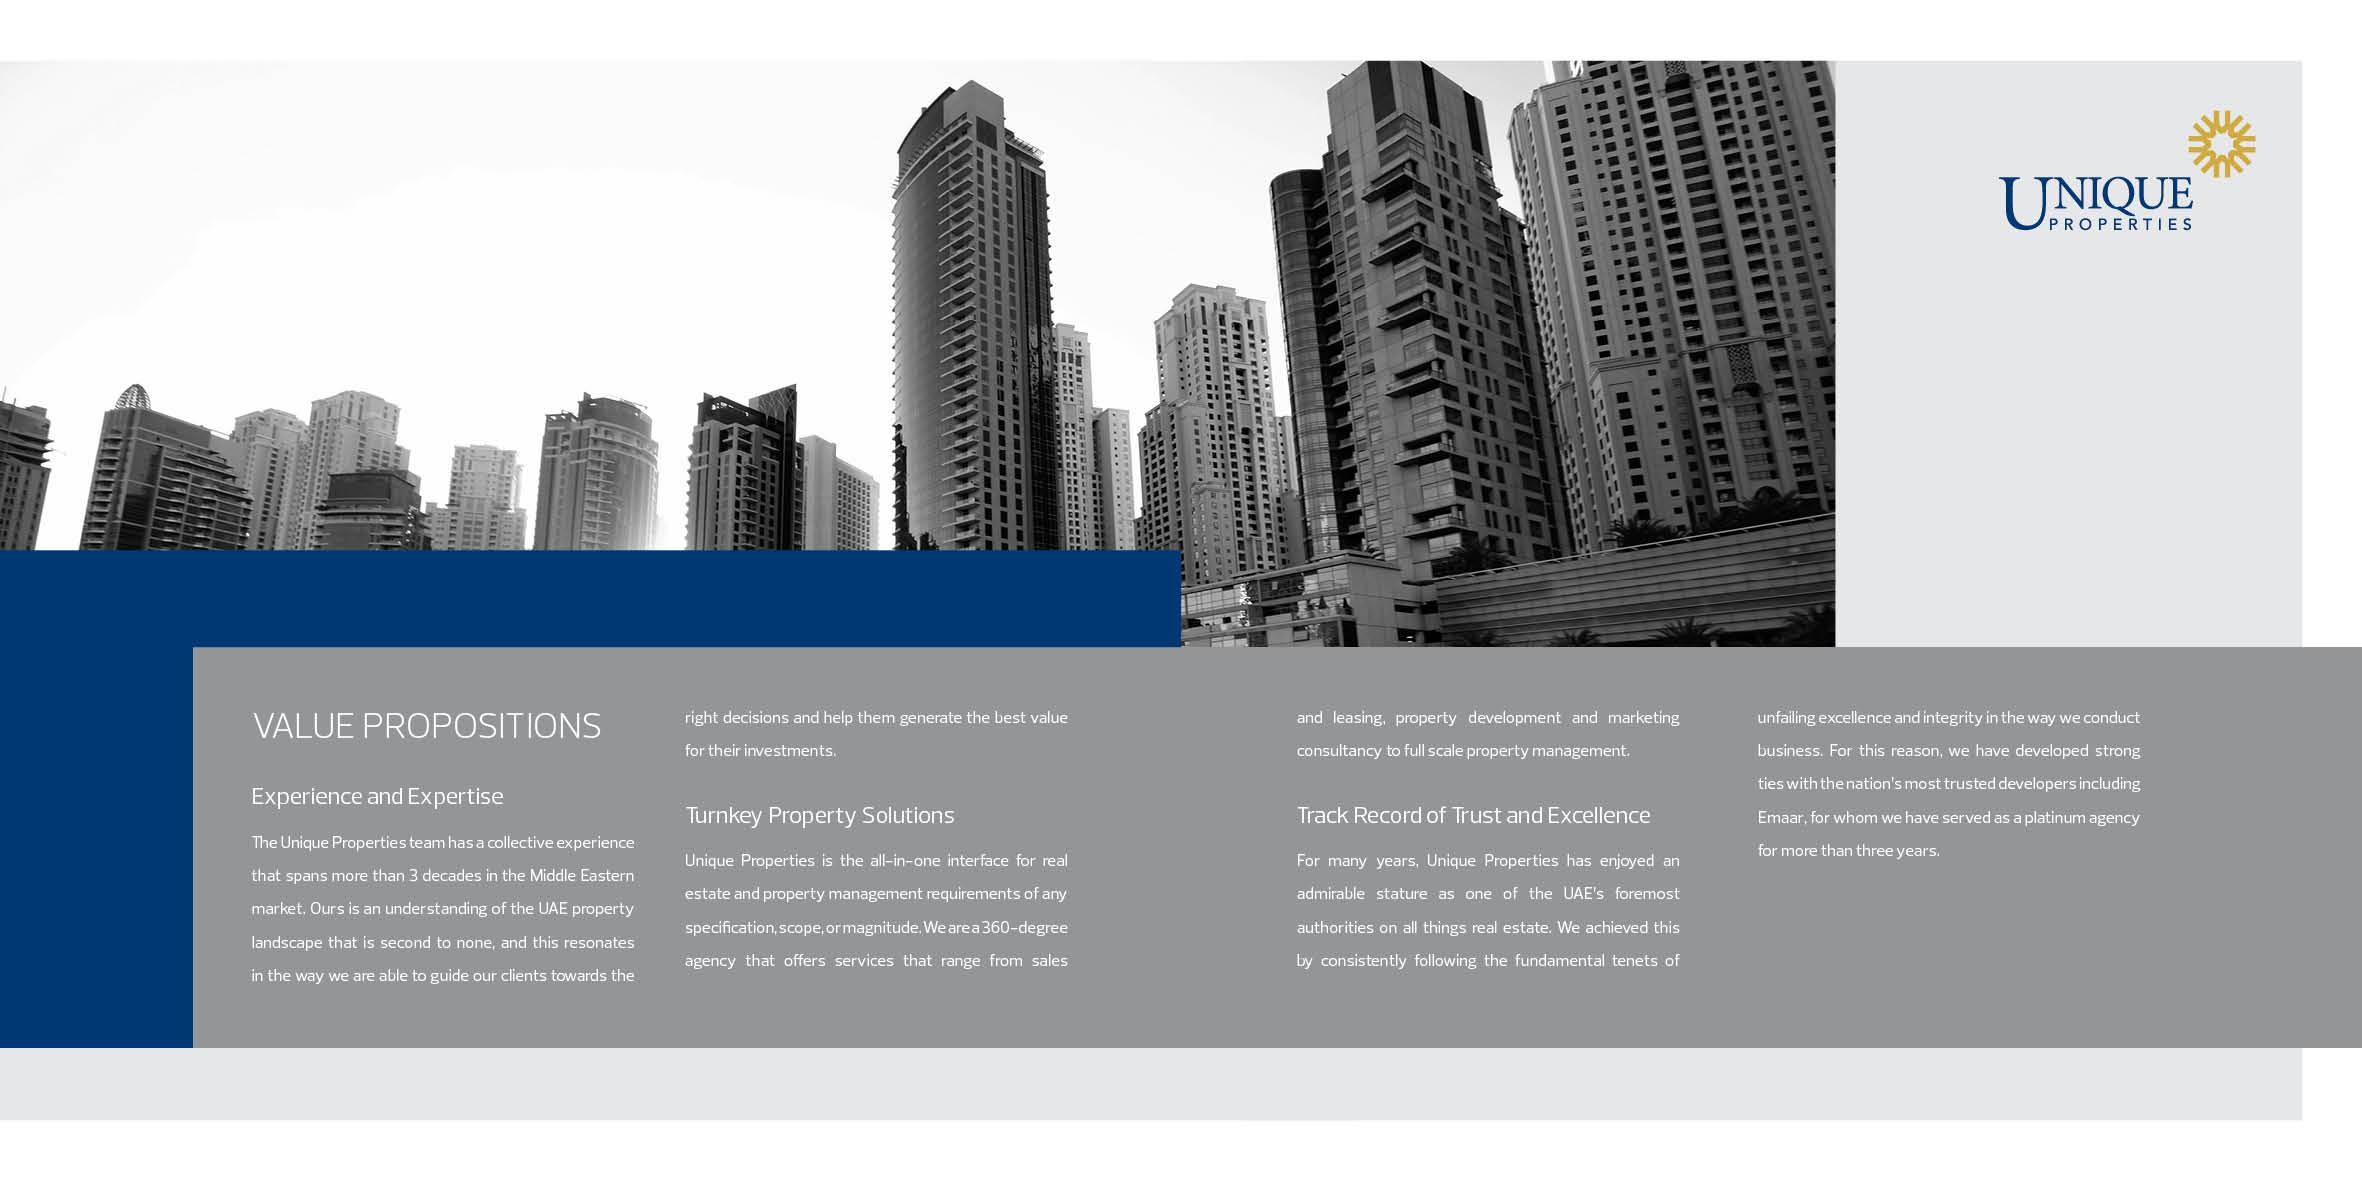 Unique Properties_Inside pages5.jpg